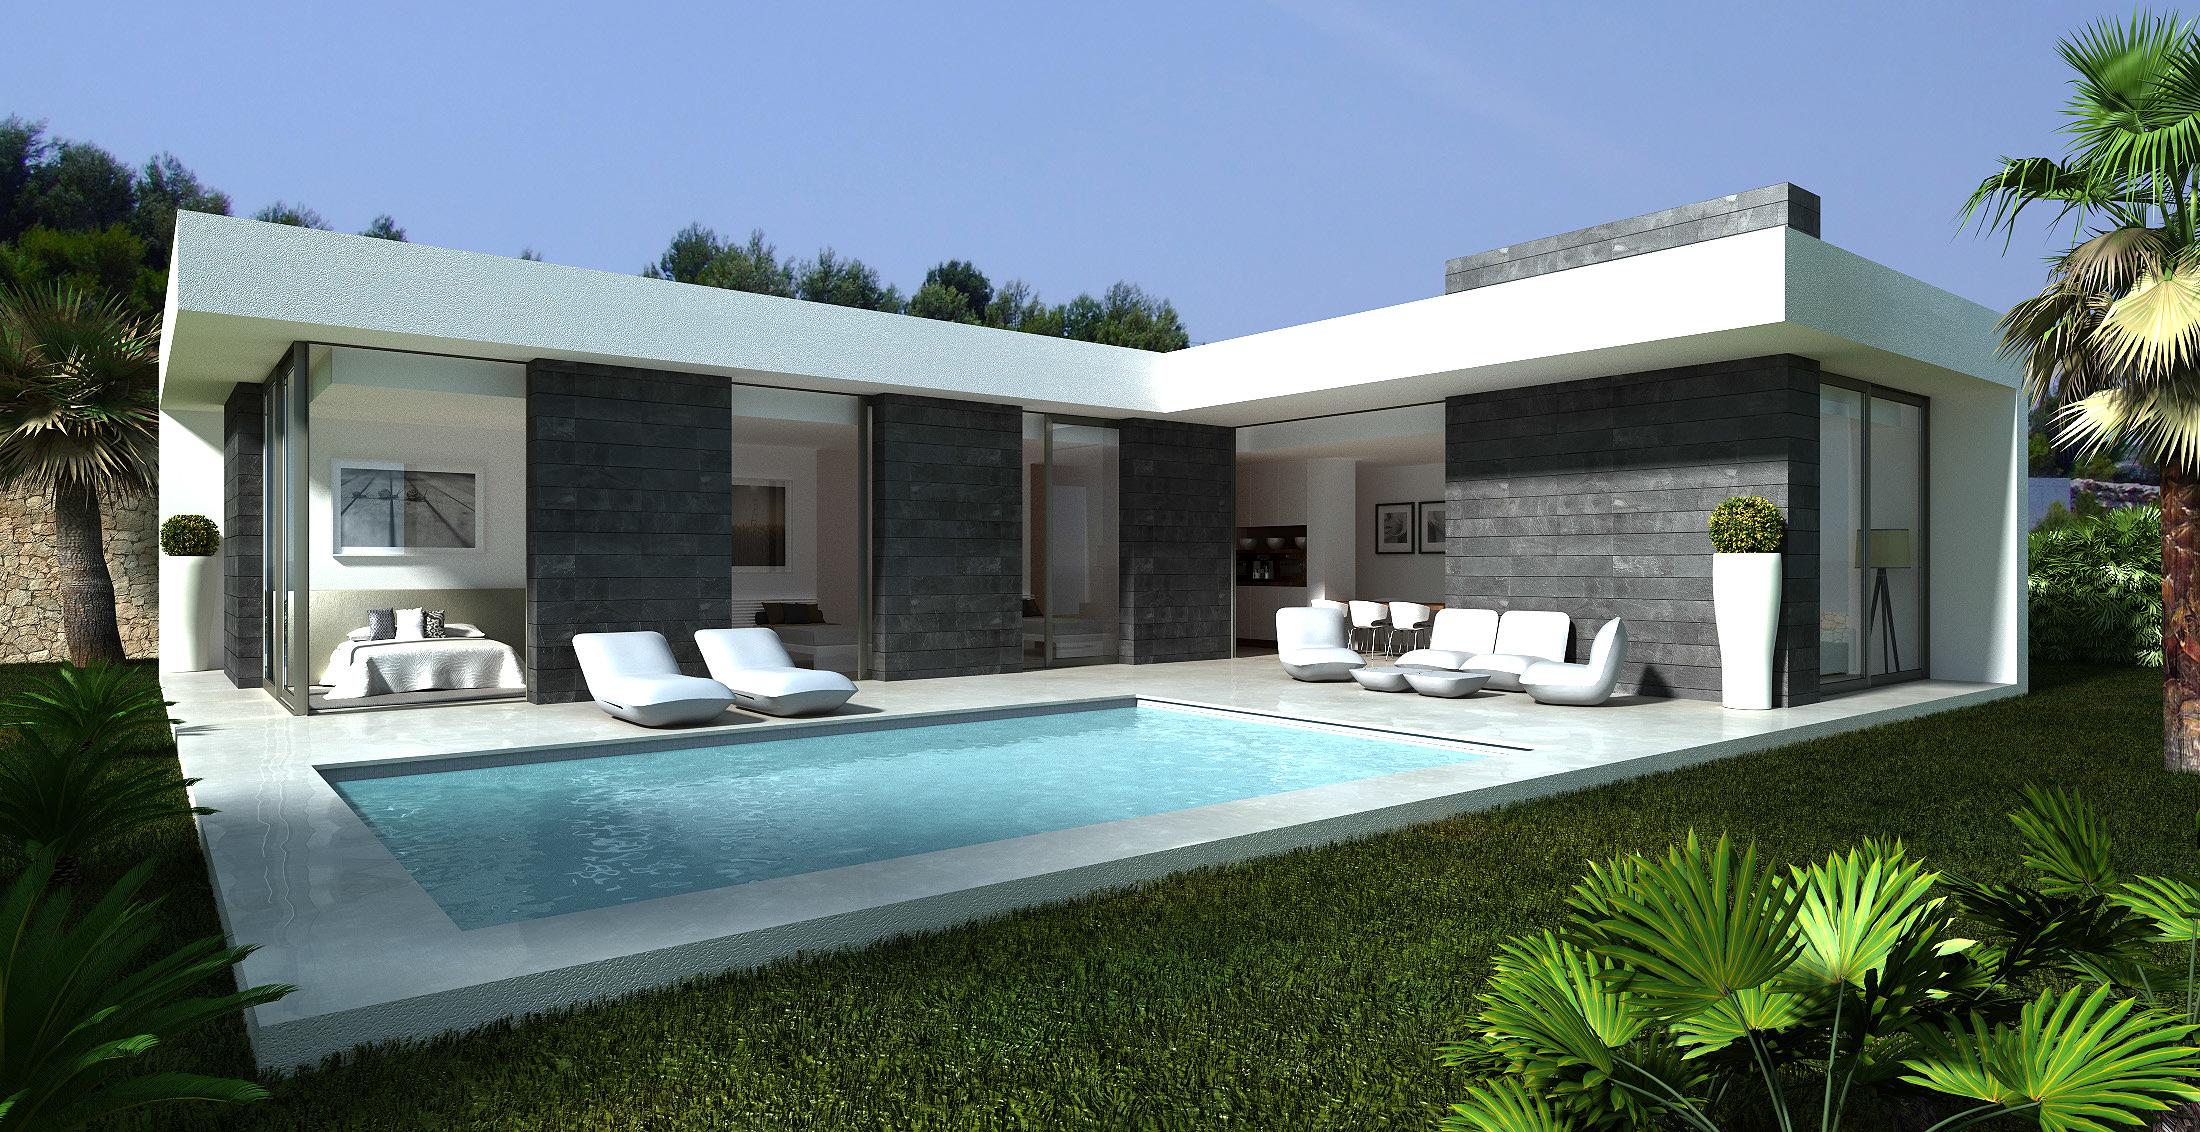 3 bedroom villa for sale in denia girasol homes belgium for 9 bedroom homes for sale